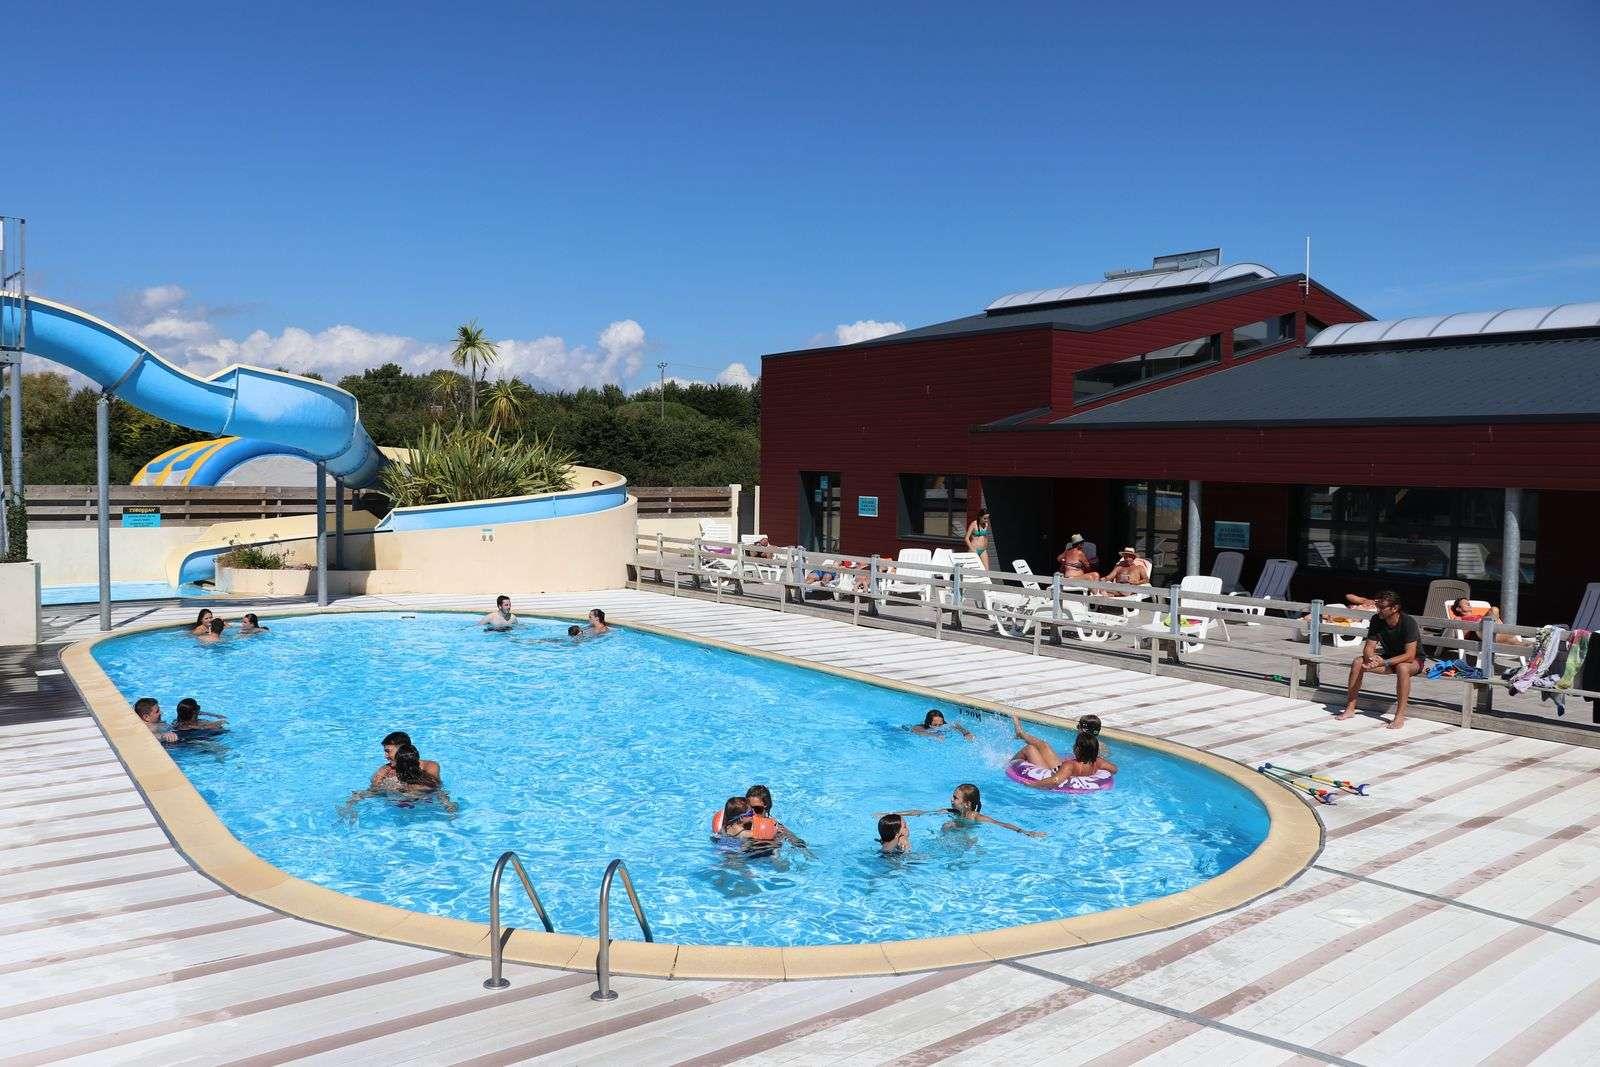 Piscine - Toboggan - extérieur - Camping de Kersily - Plouharnel - Morbihan Bretagne Sud